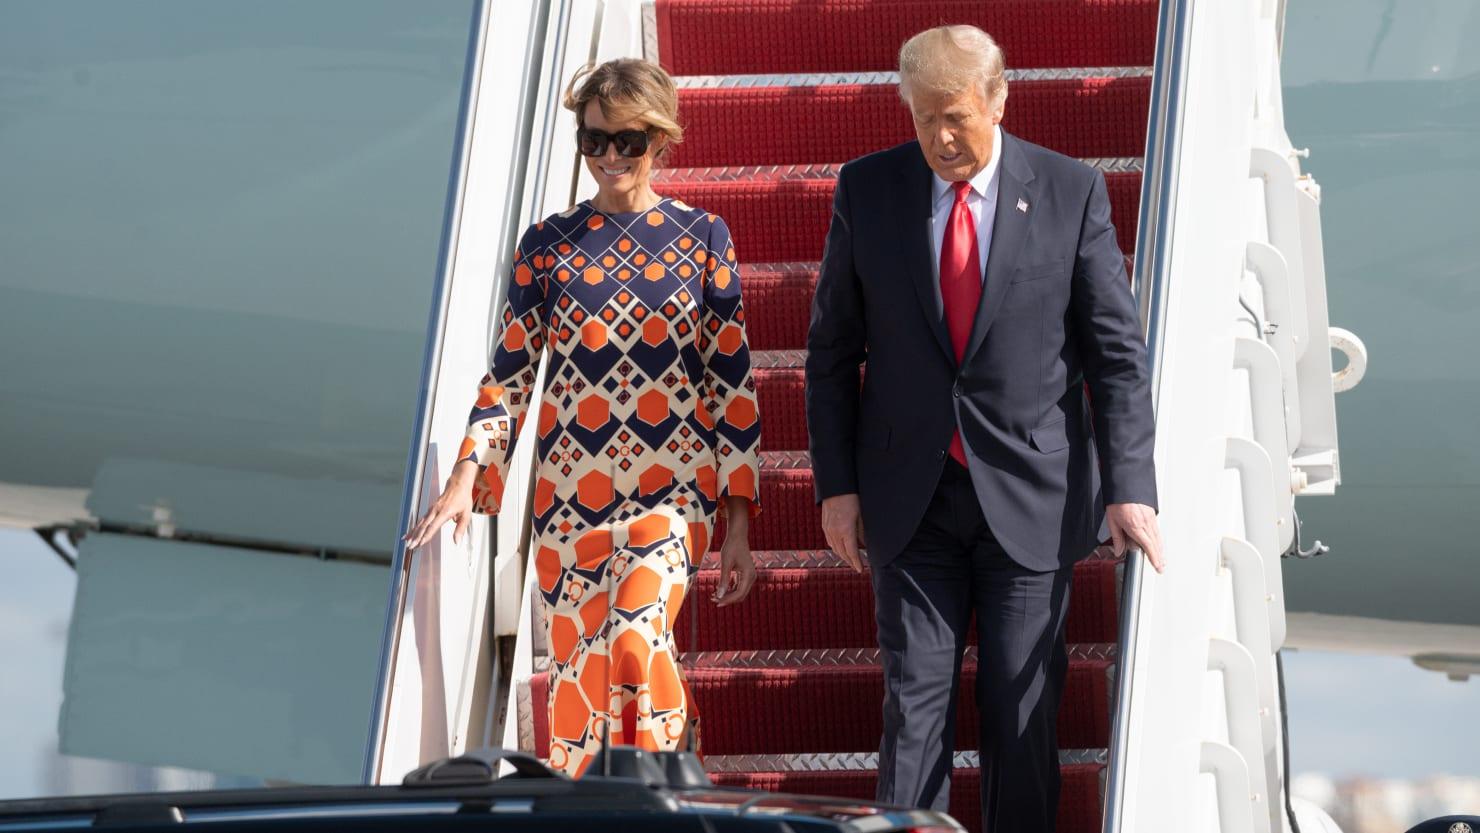 Trump International Airport? Not in Palm Beach.